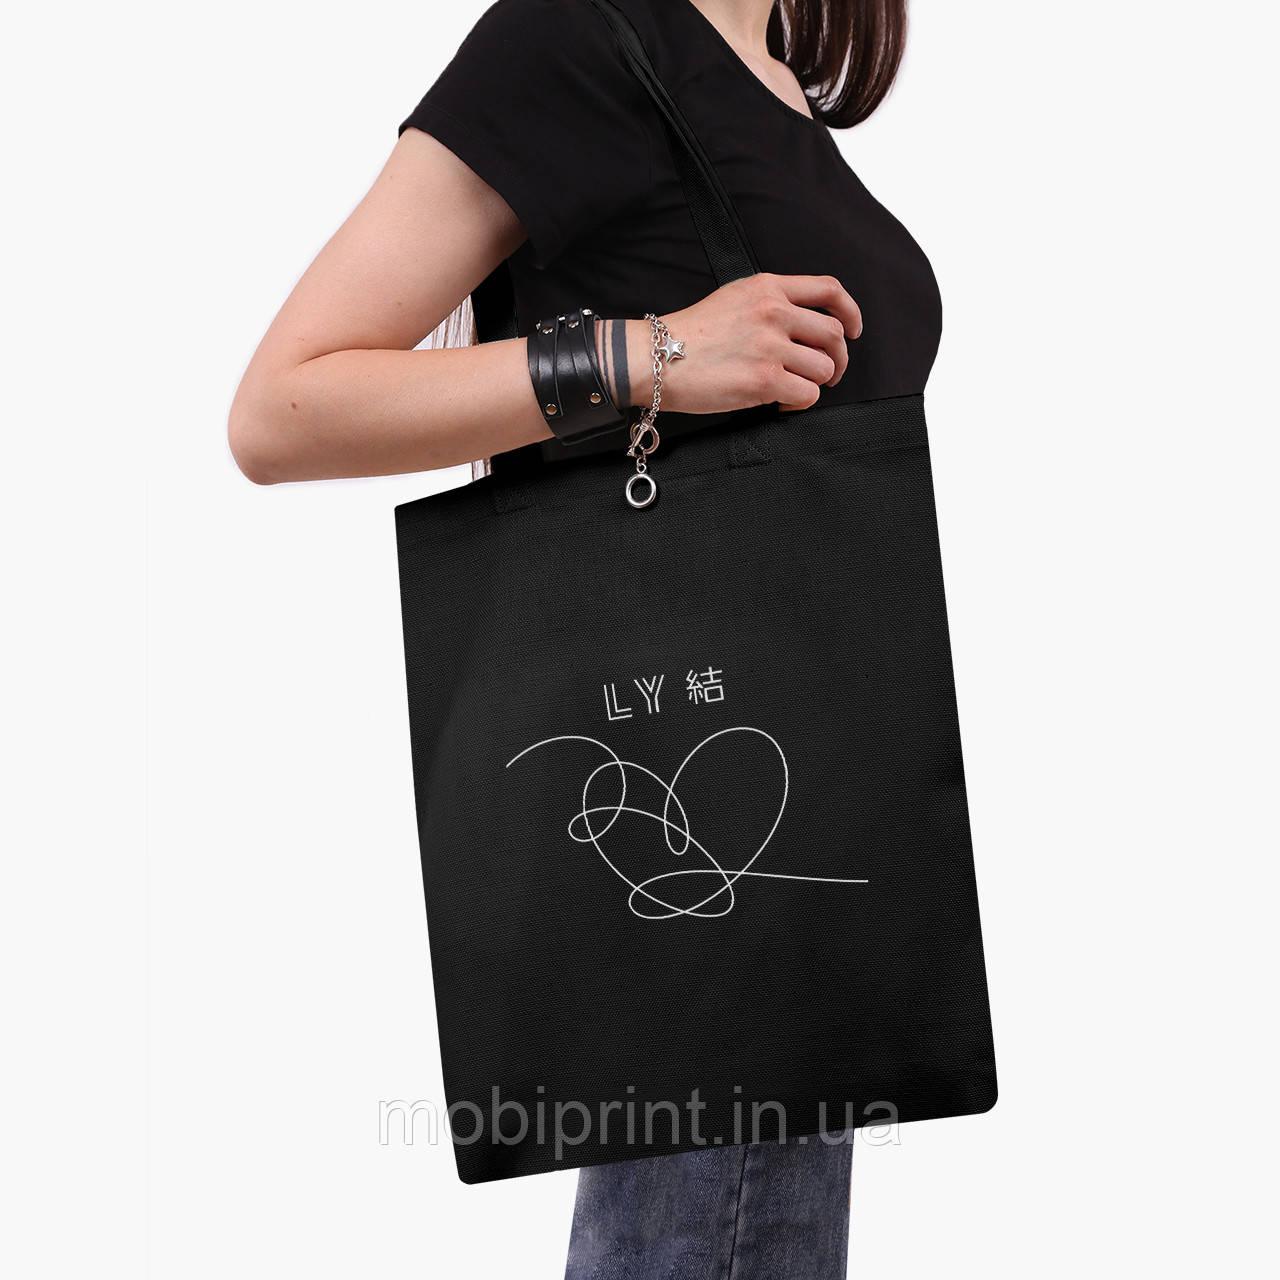 Еко сумка шоппер чорна БТС (BTS) (9227-1080-2) екосумка шопер 41*35 см